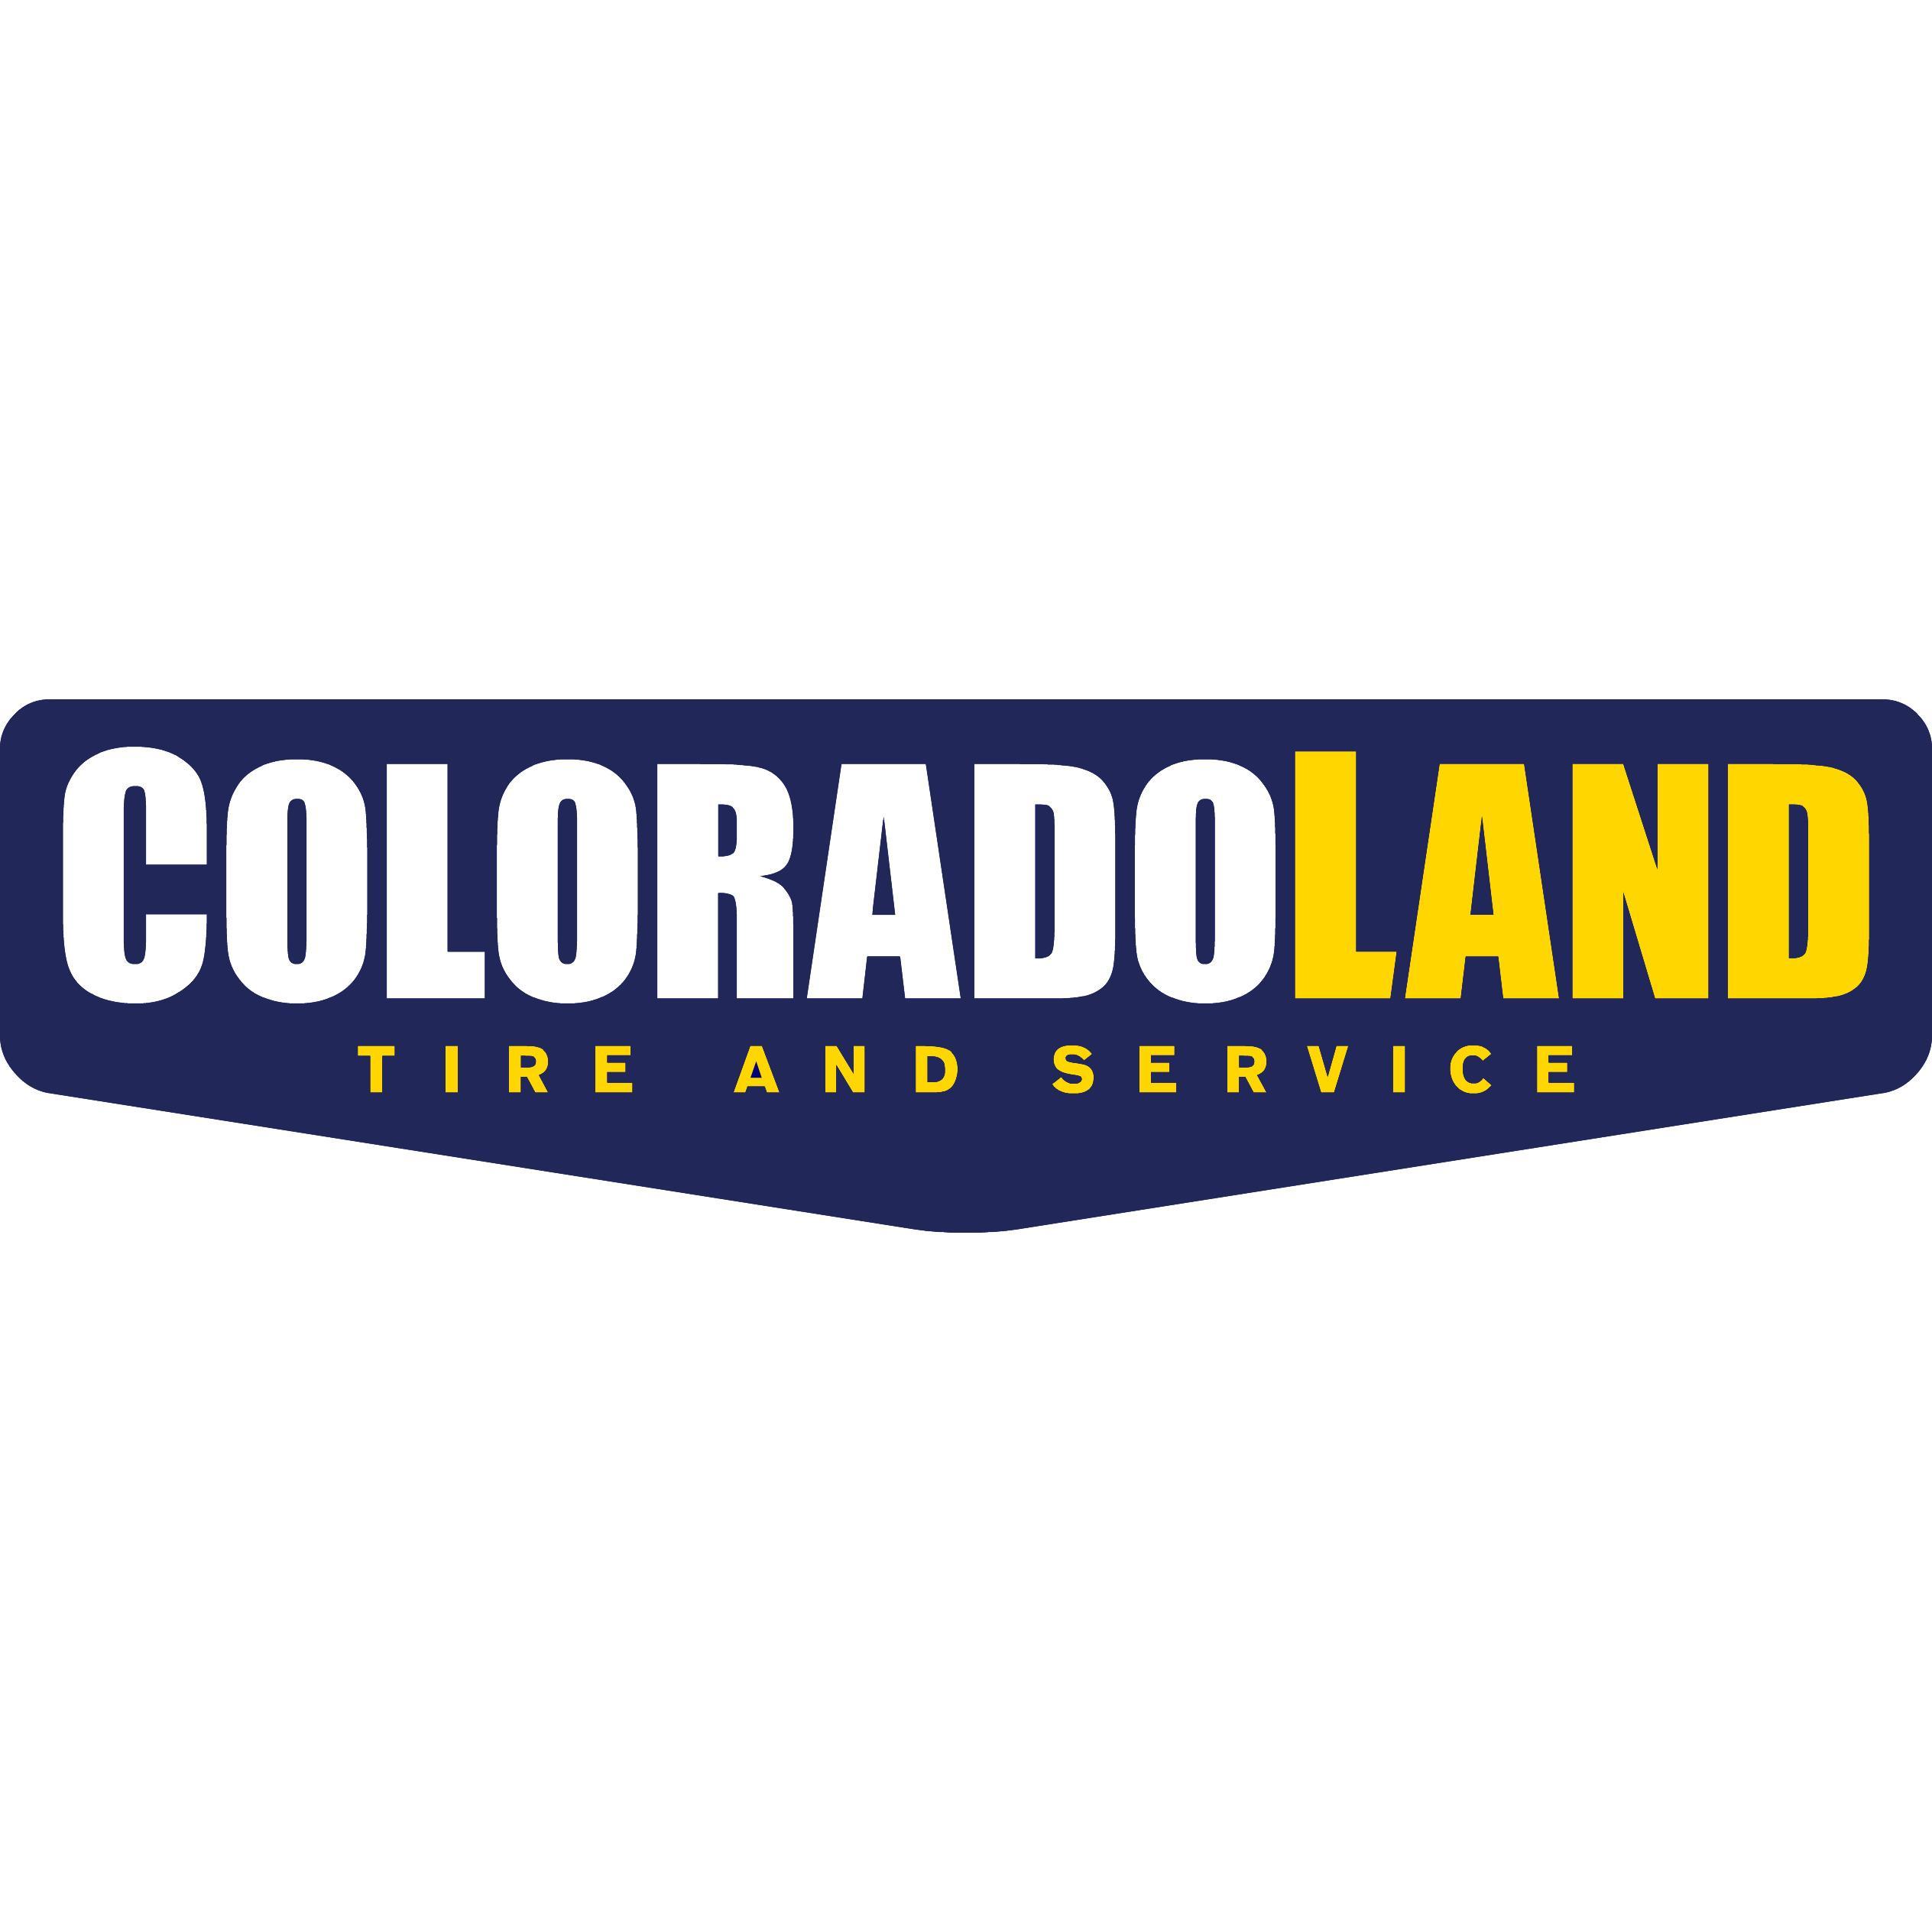 Coloradoland Tire & Service